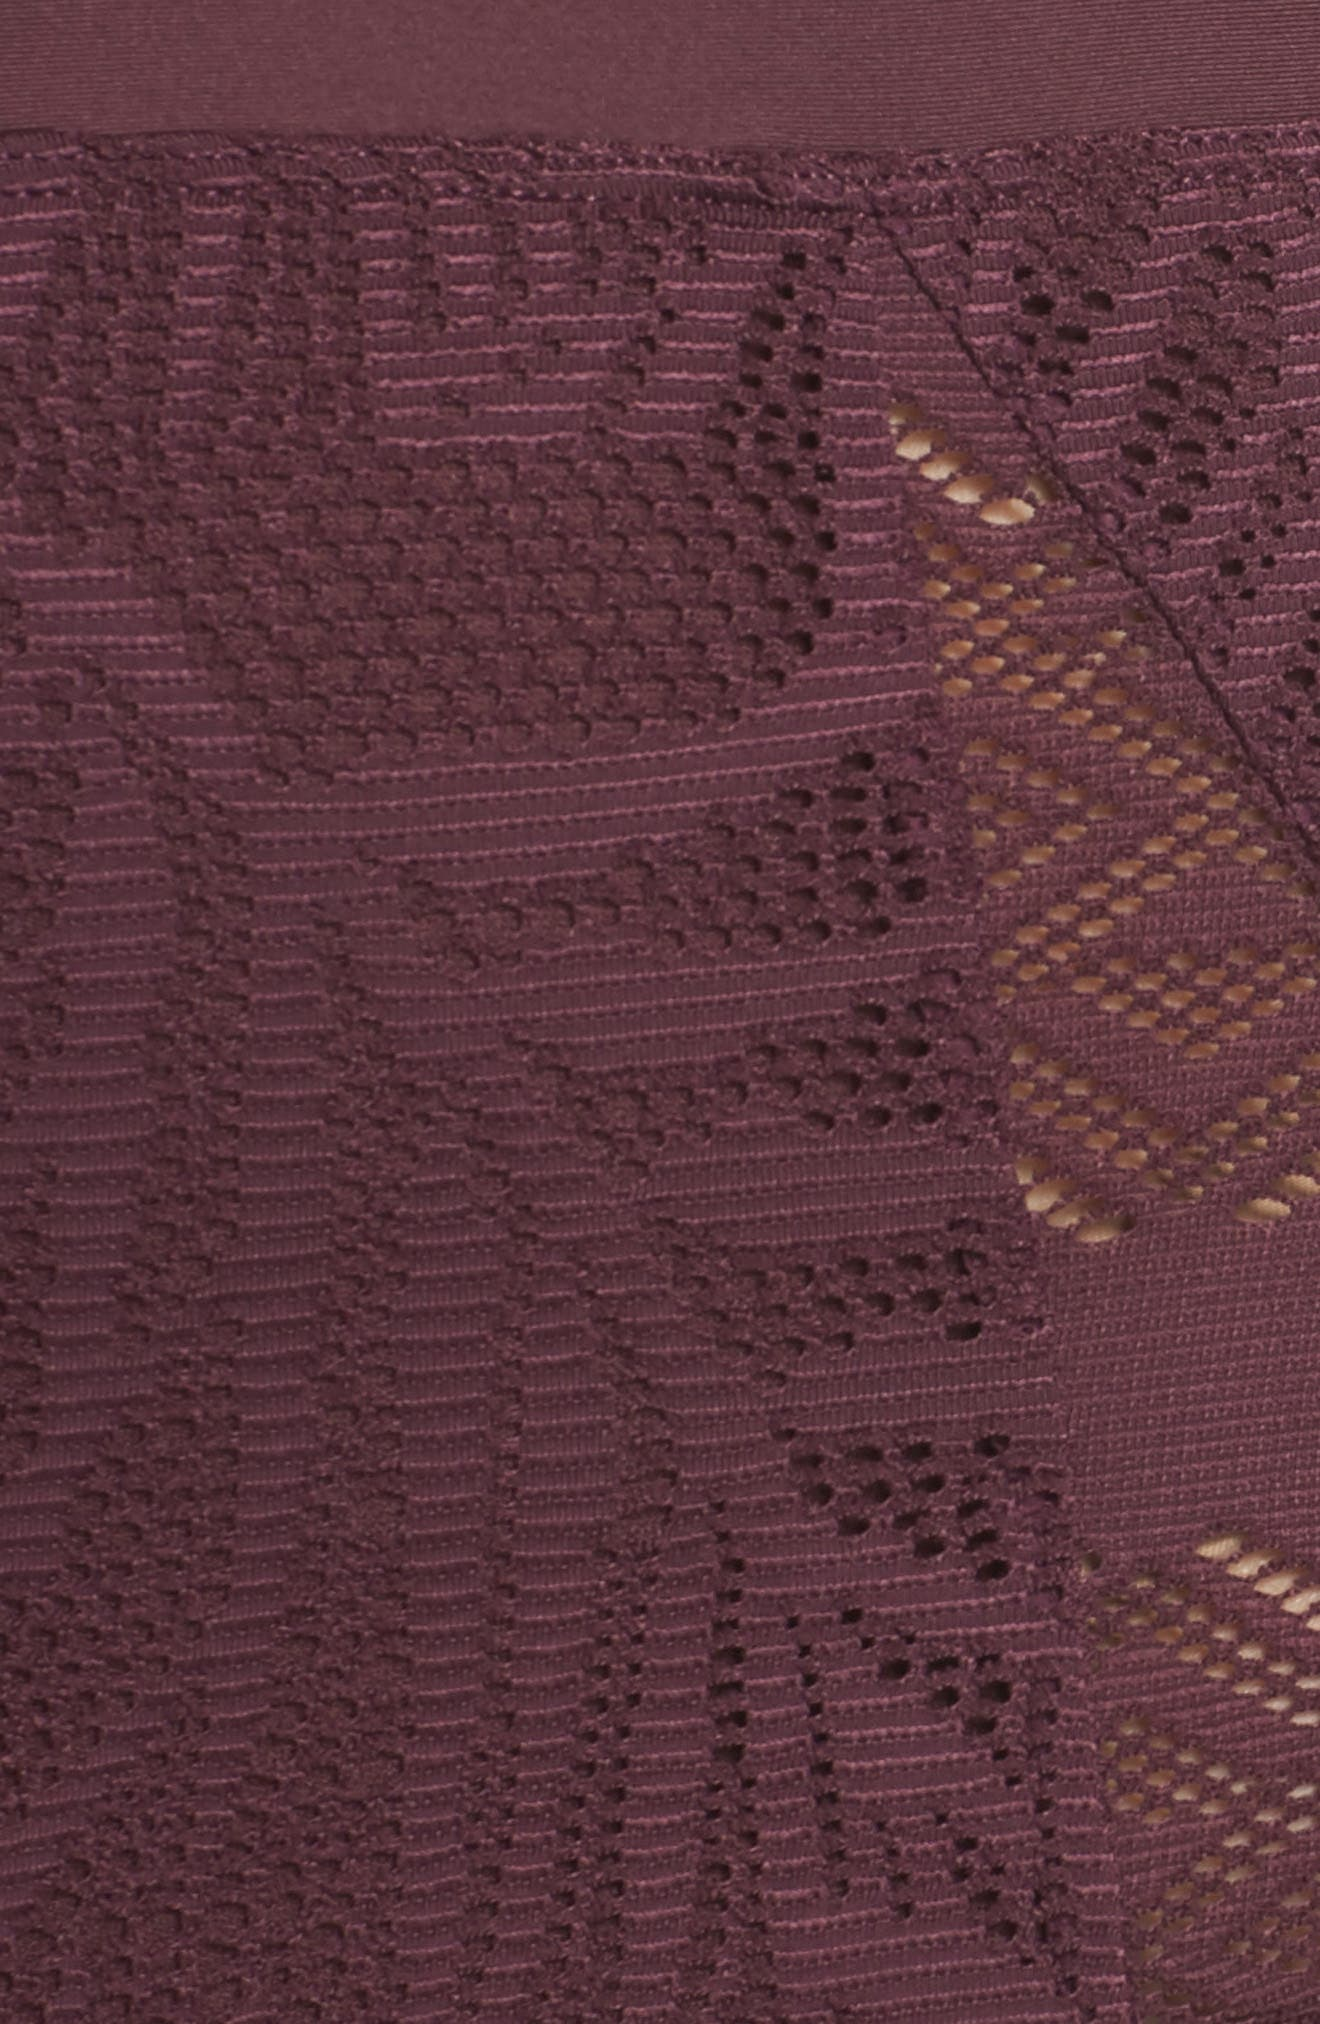 Crochet Inset High Waist Bikini Bottoms,                             Alternate thumbnail 5, color,                             930